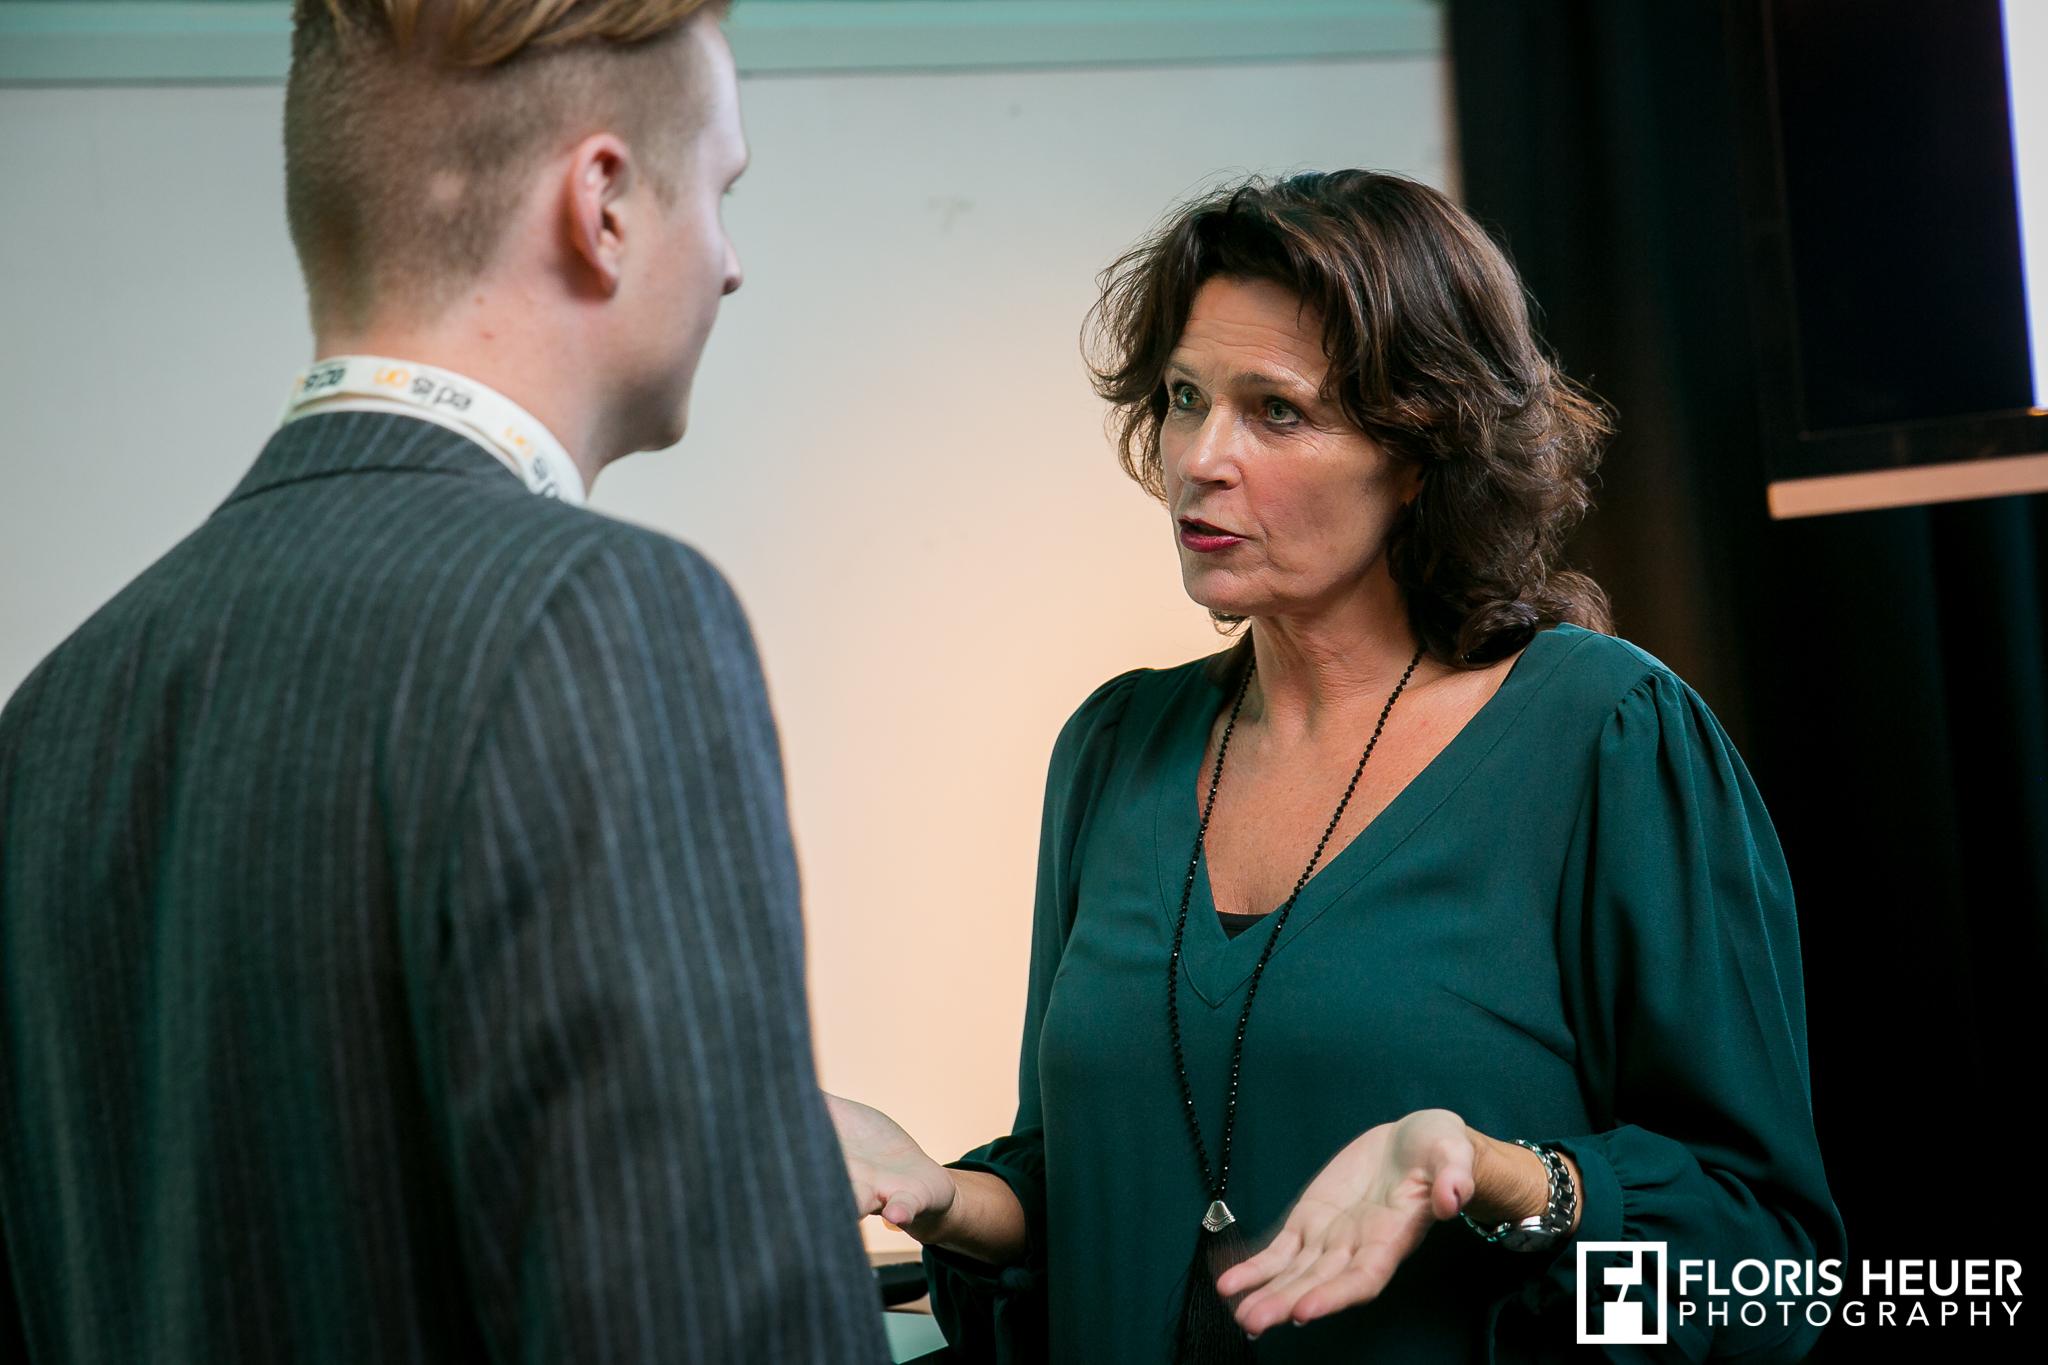 Workshop Theater Locaties Nederland - Sales Funnel Management en Conversie